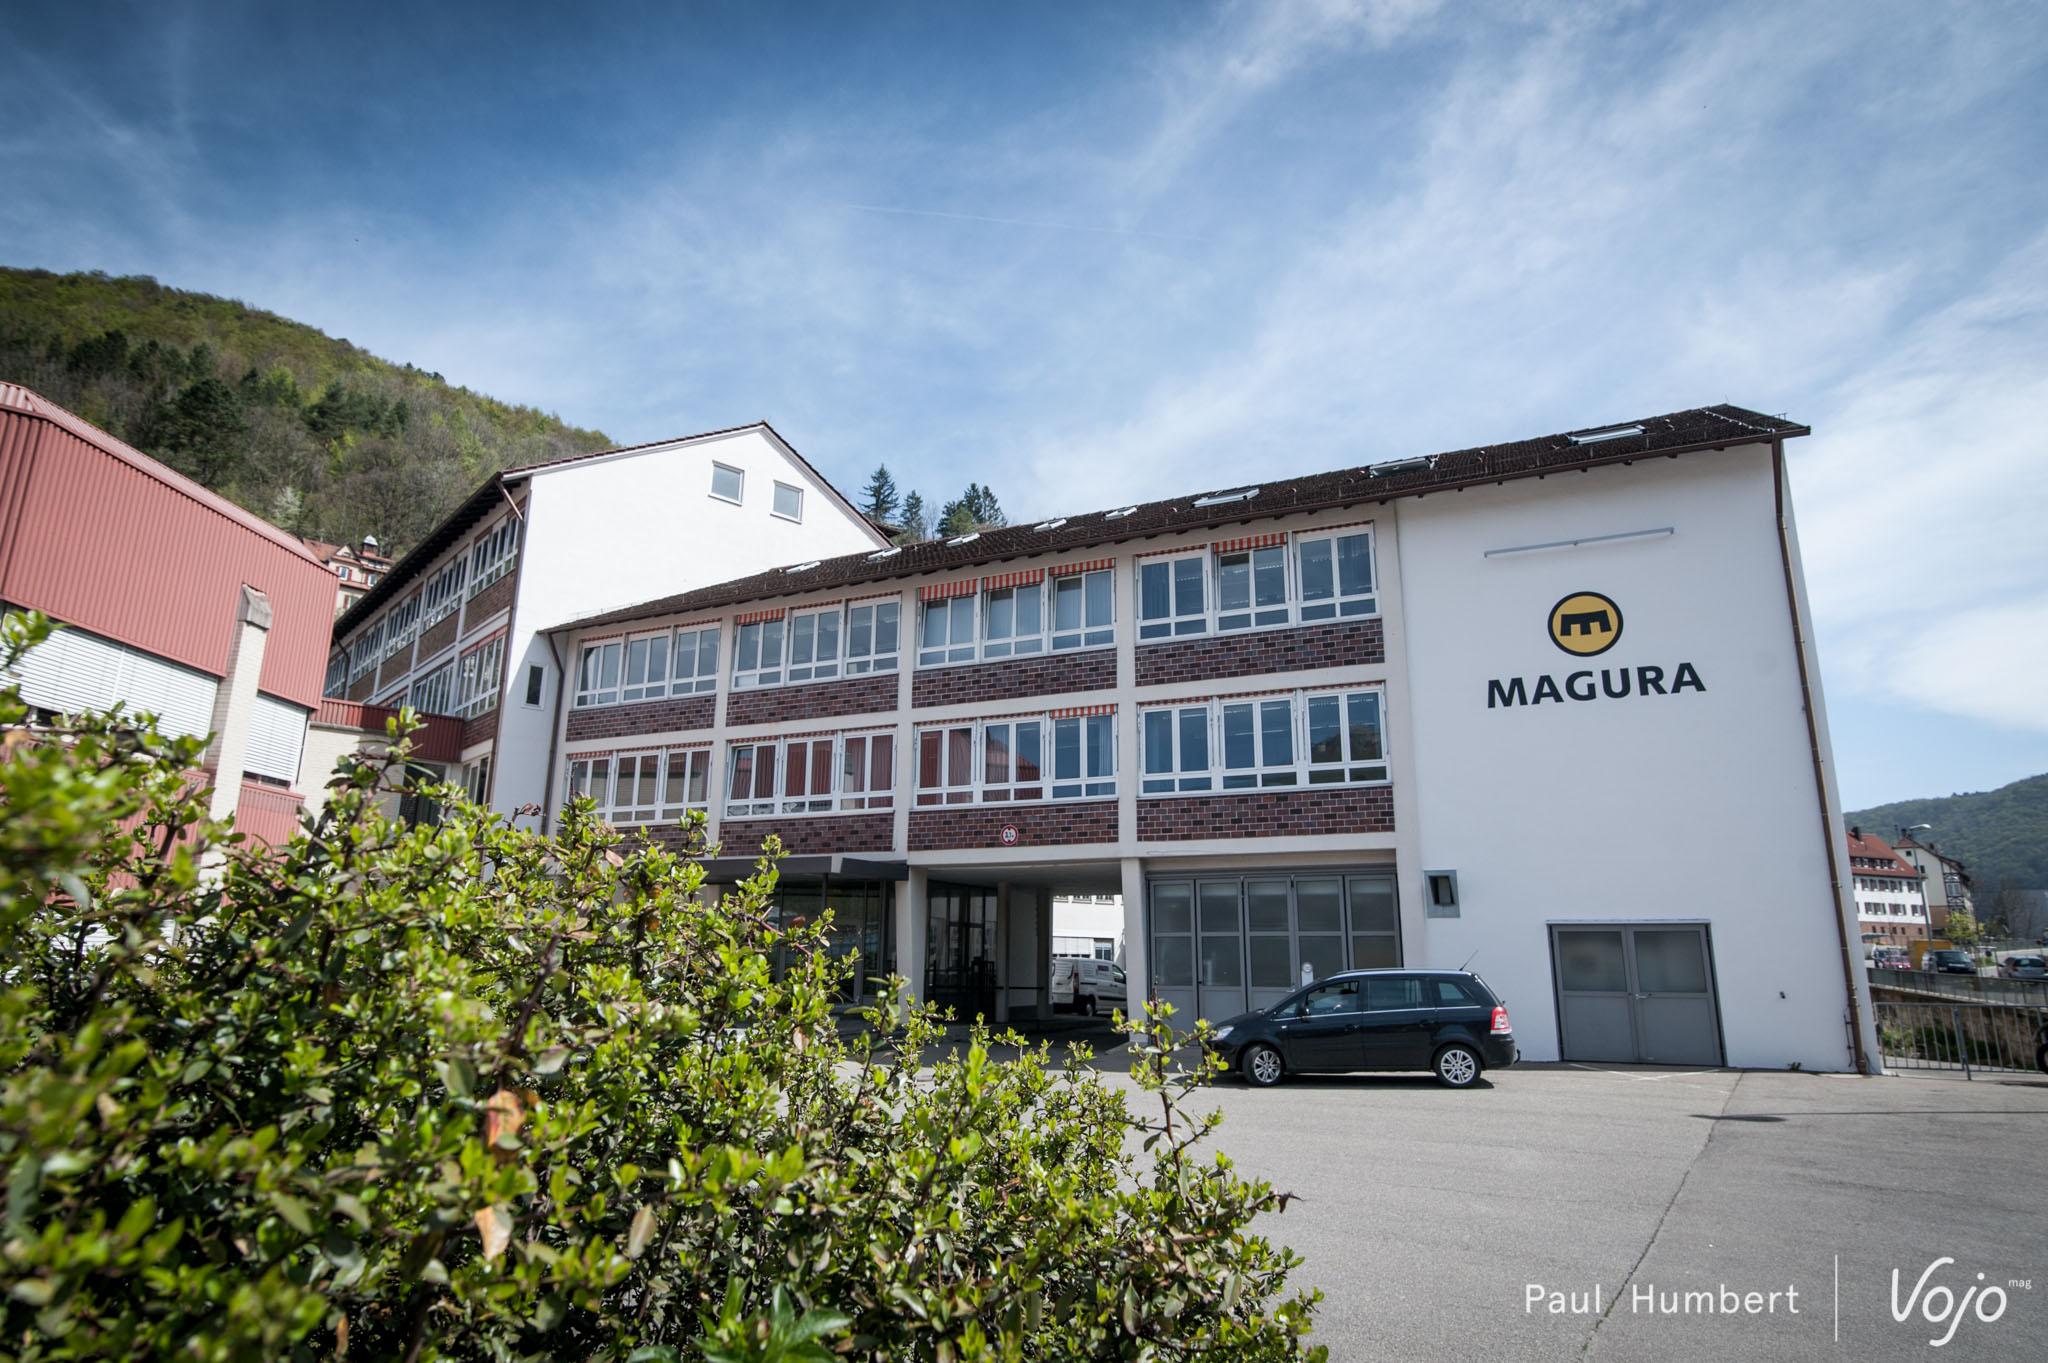 visite-magura-2016-vojo-paul-humbert-112